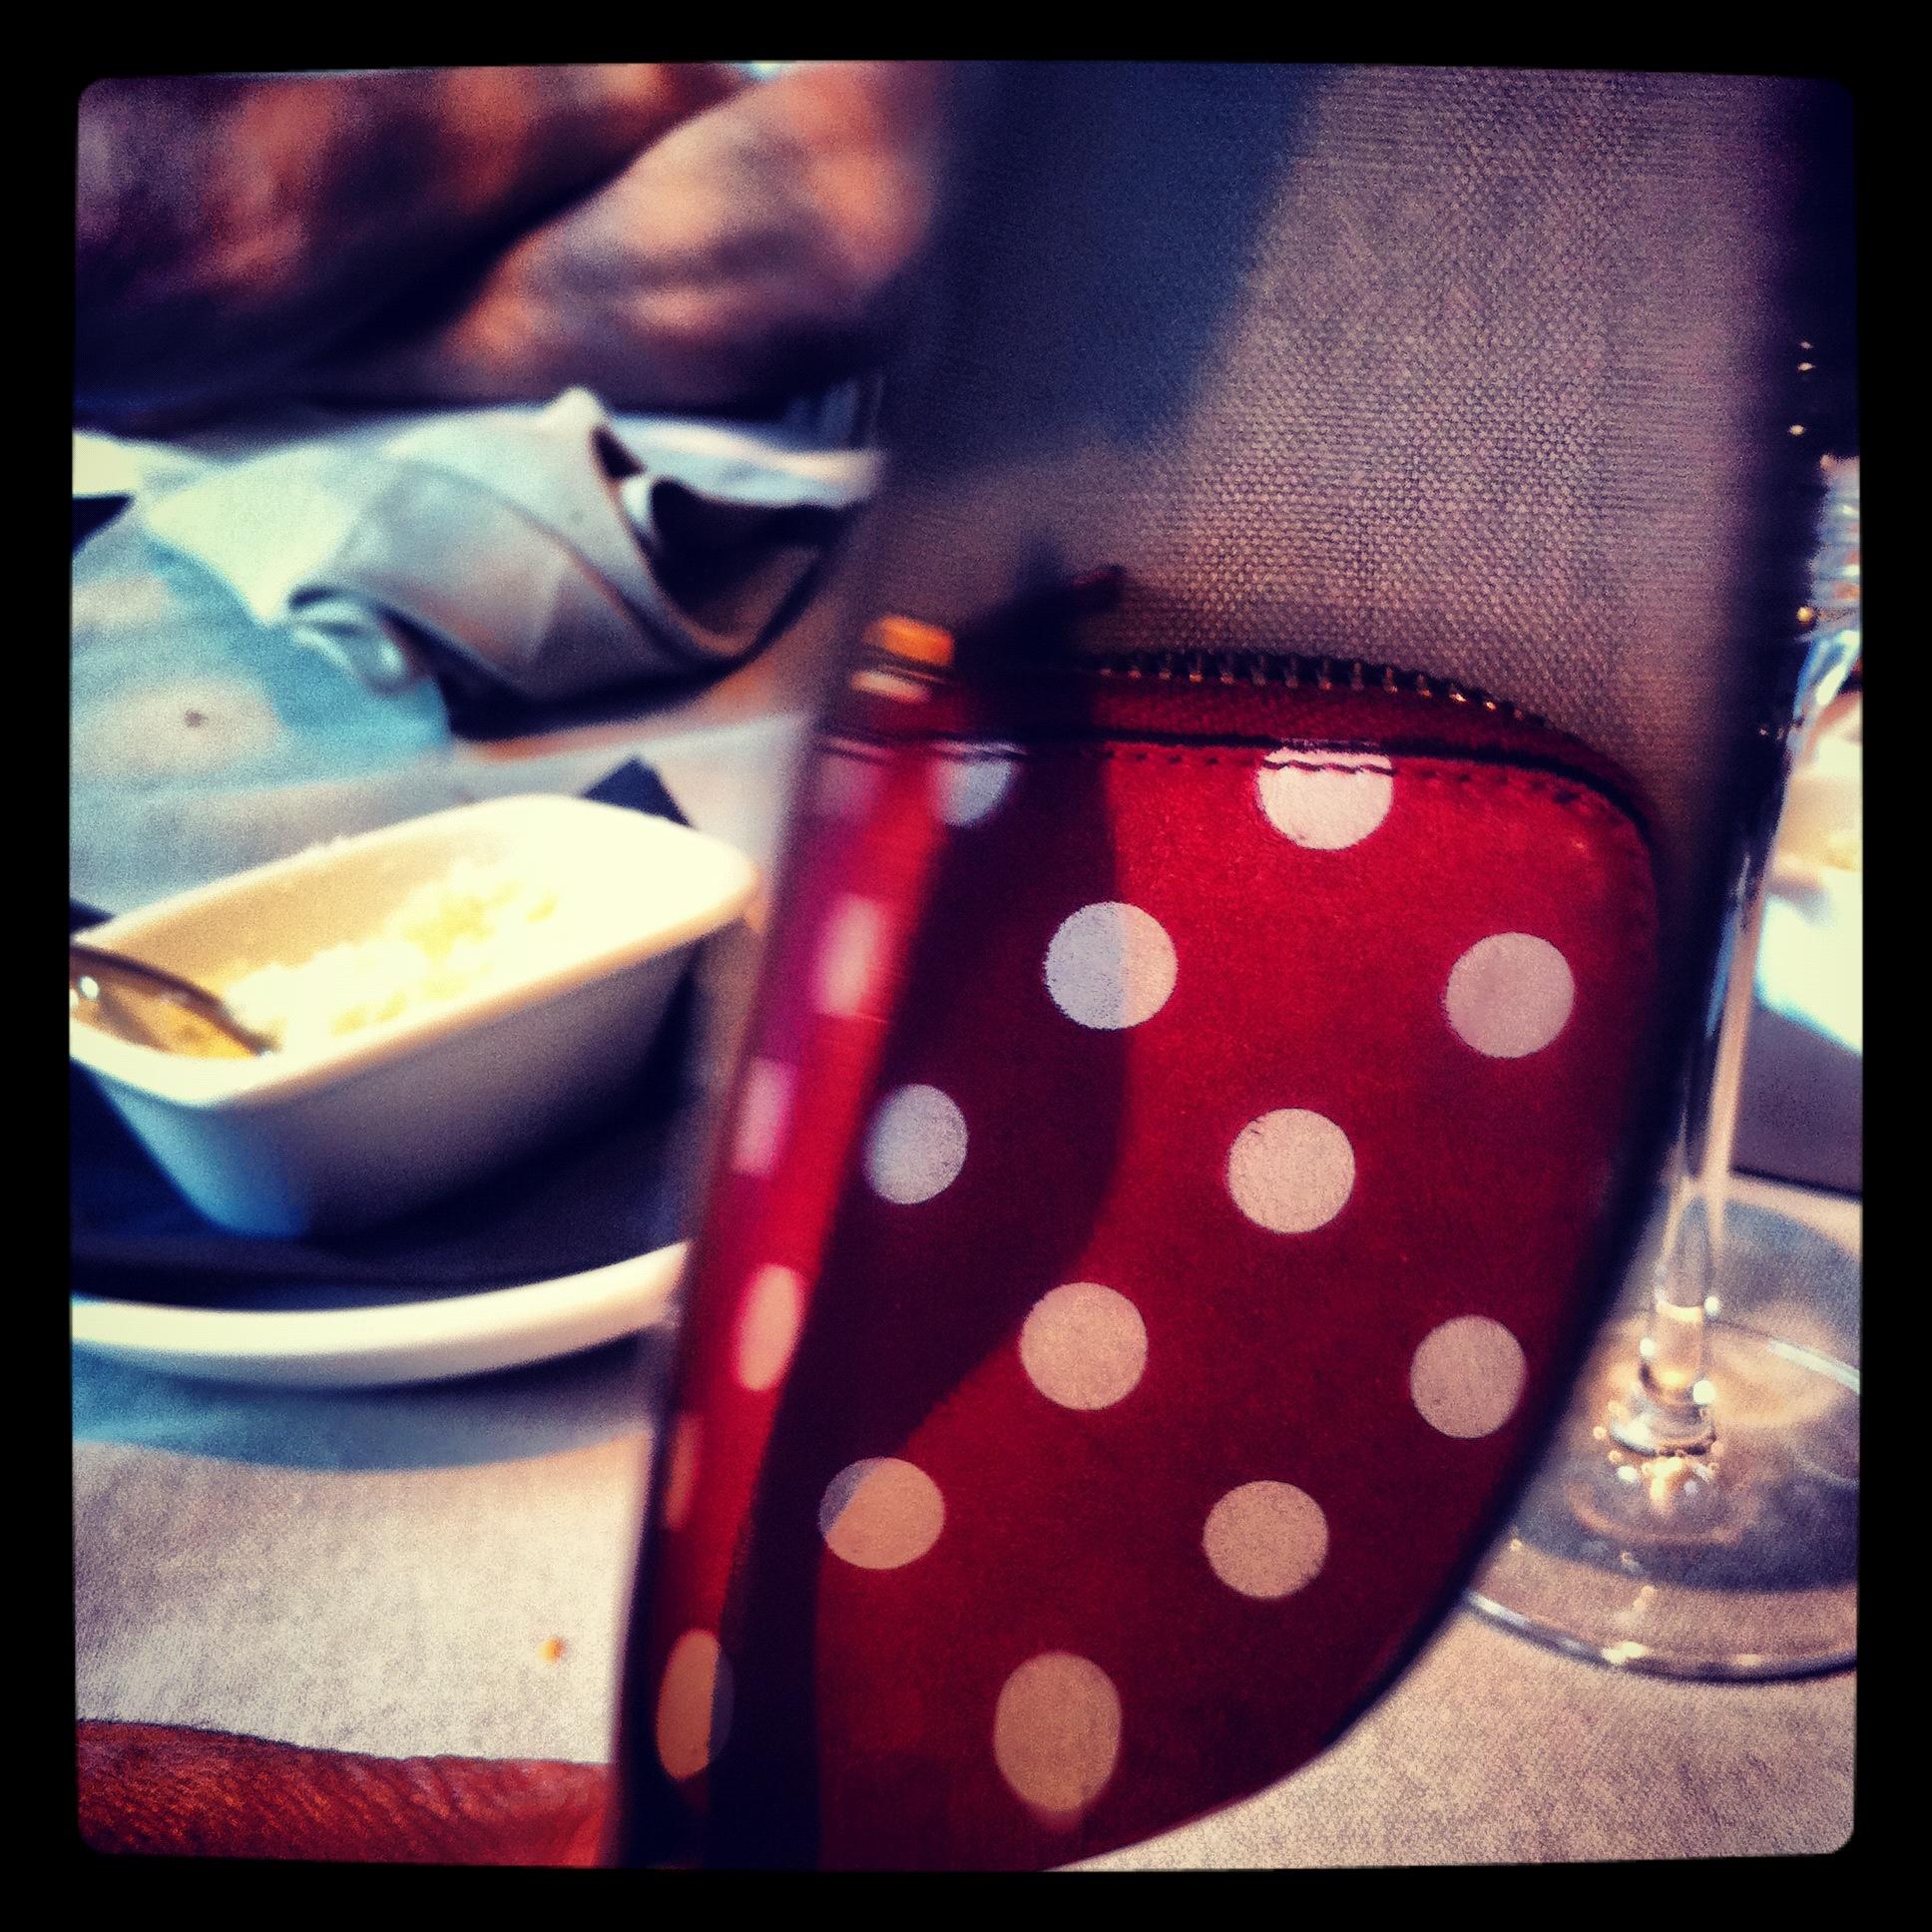 Polka dot knife